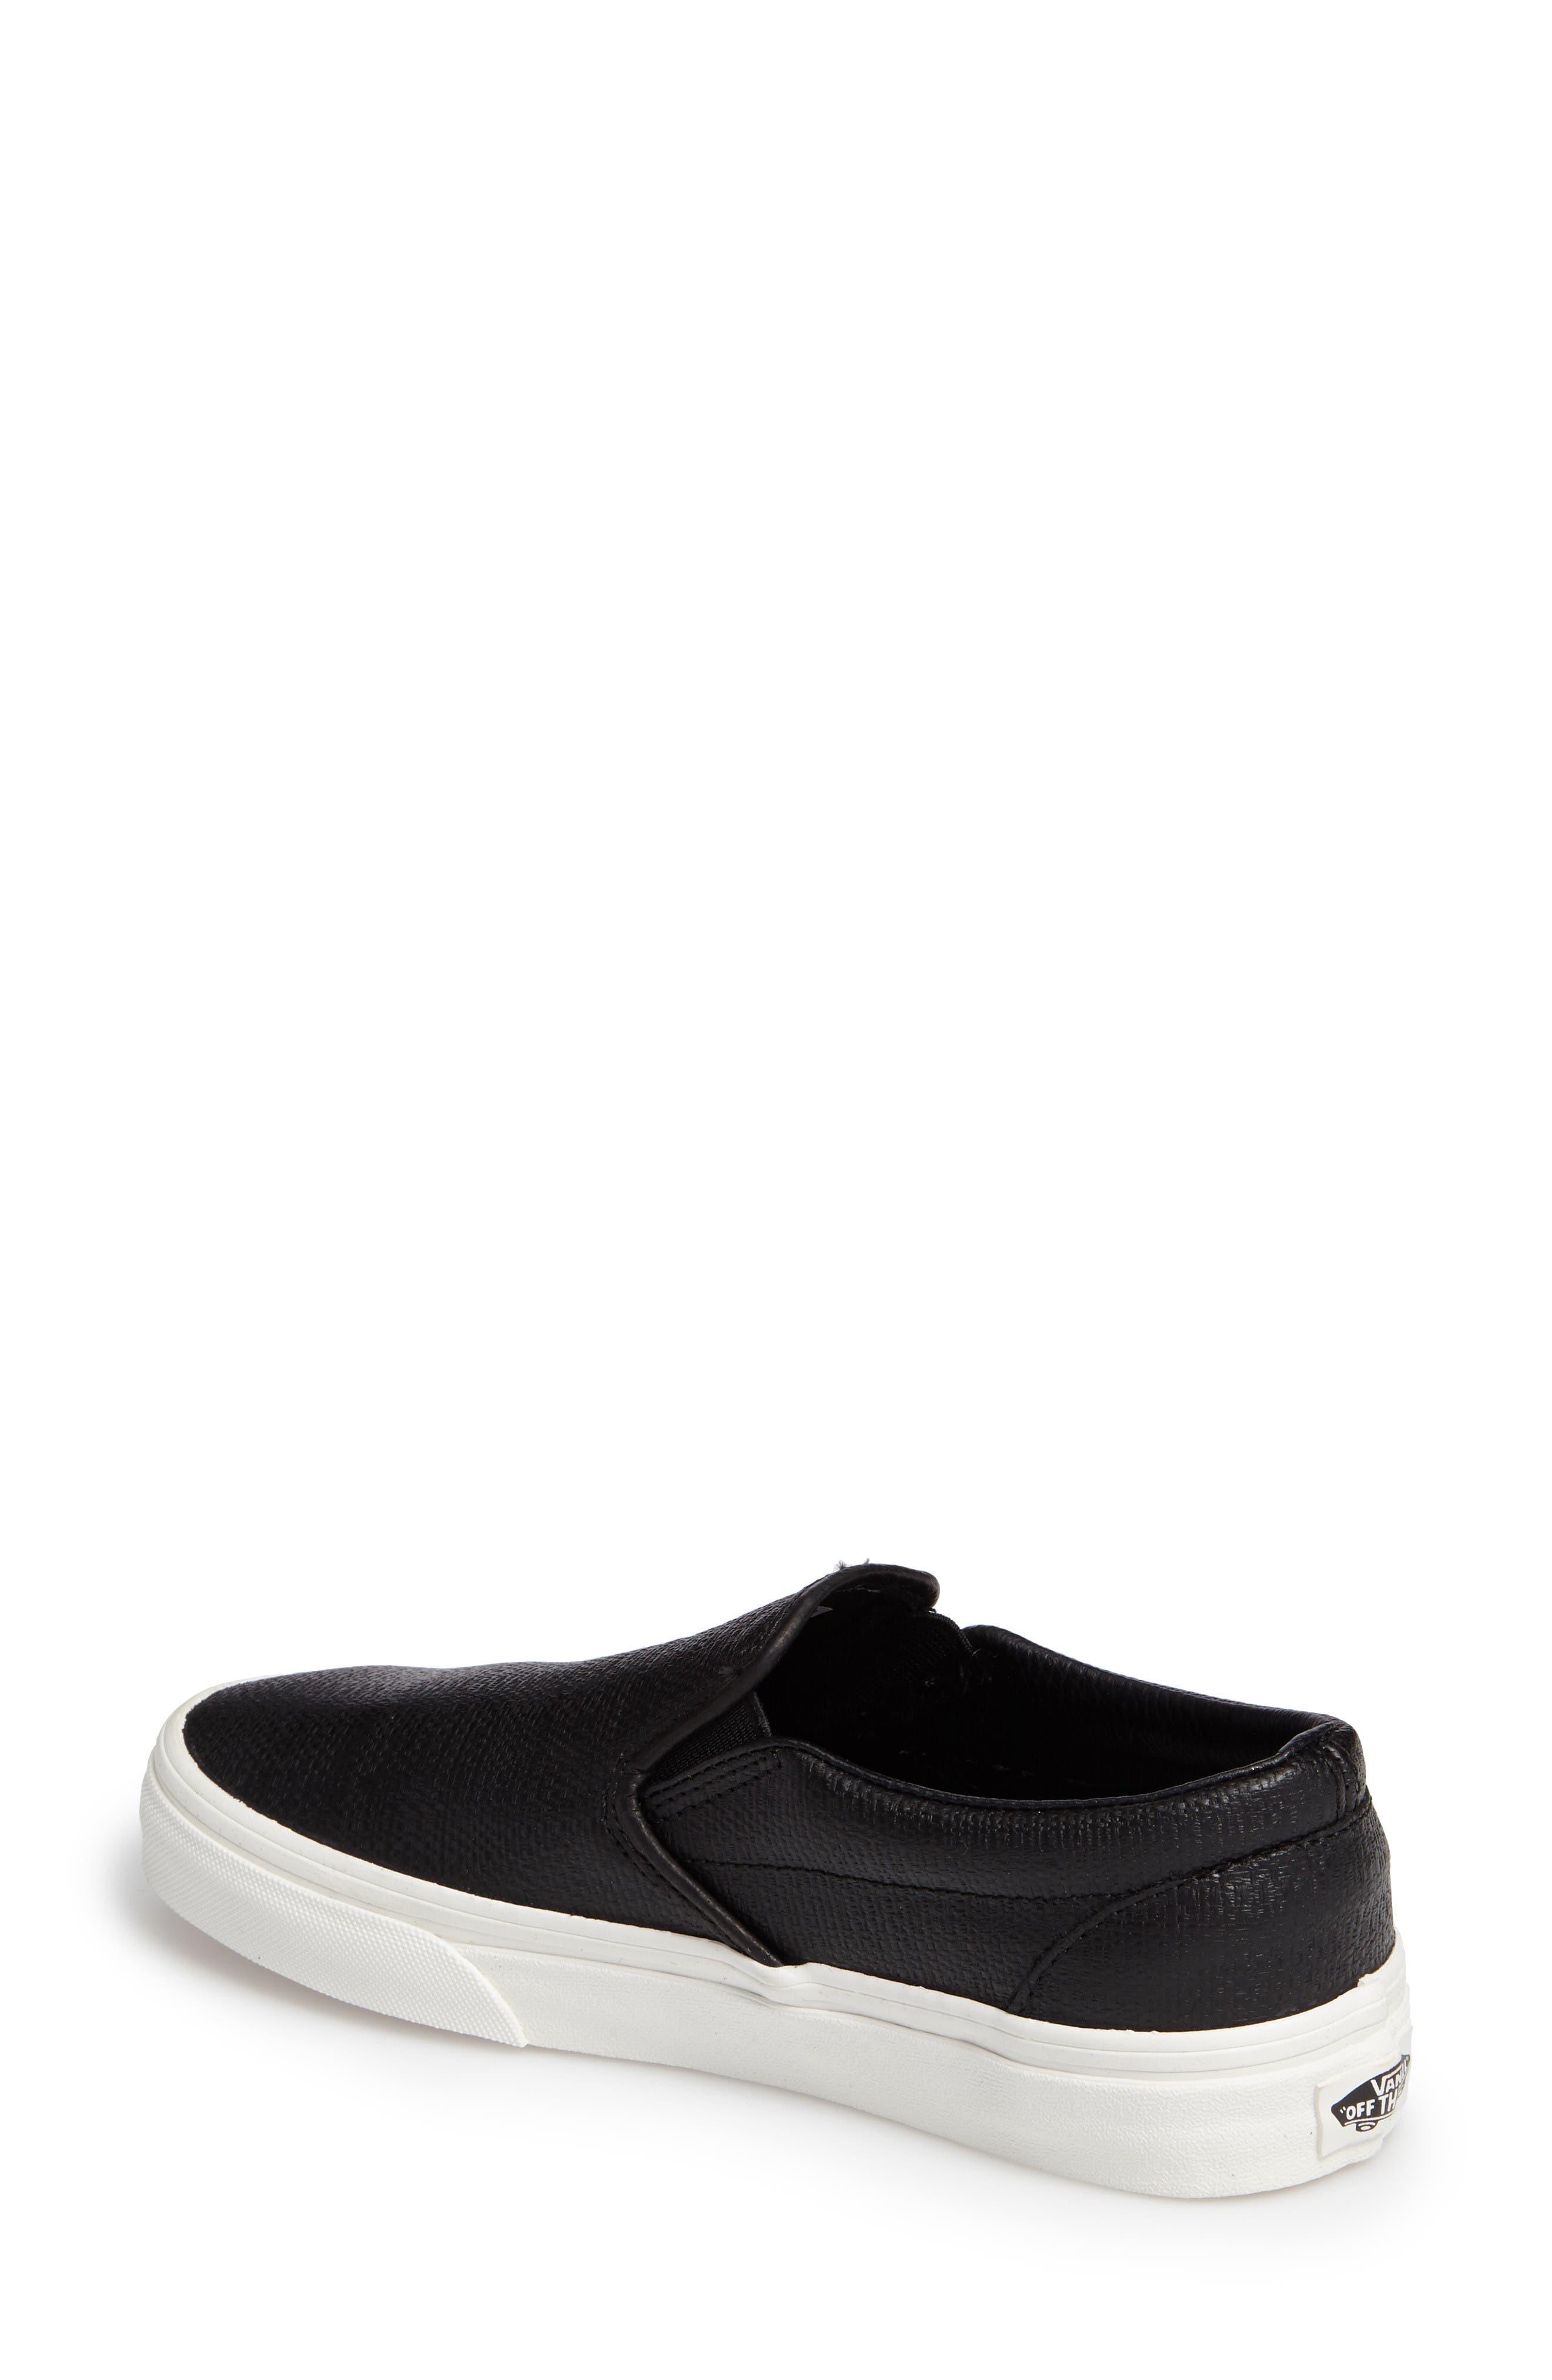 Alternate Image 2  - Vans Glacie Textured Sneaker (Women)